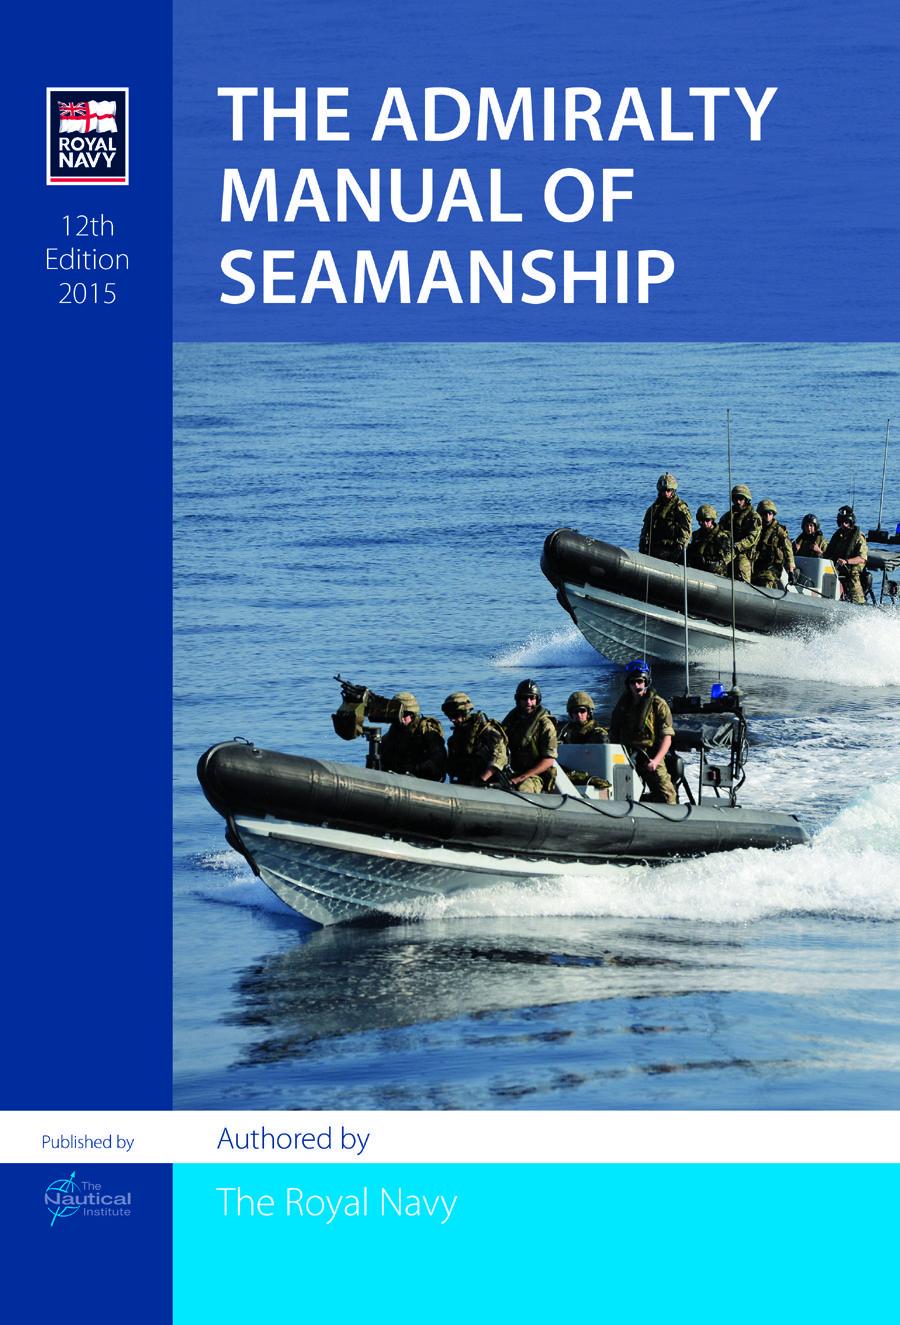 admiralty manual of seamanship 12th edition pdf